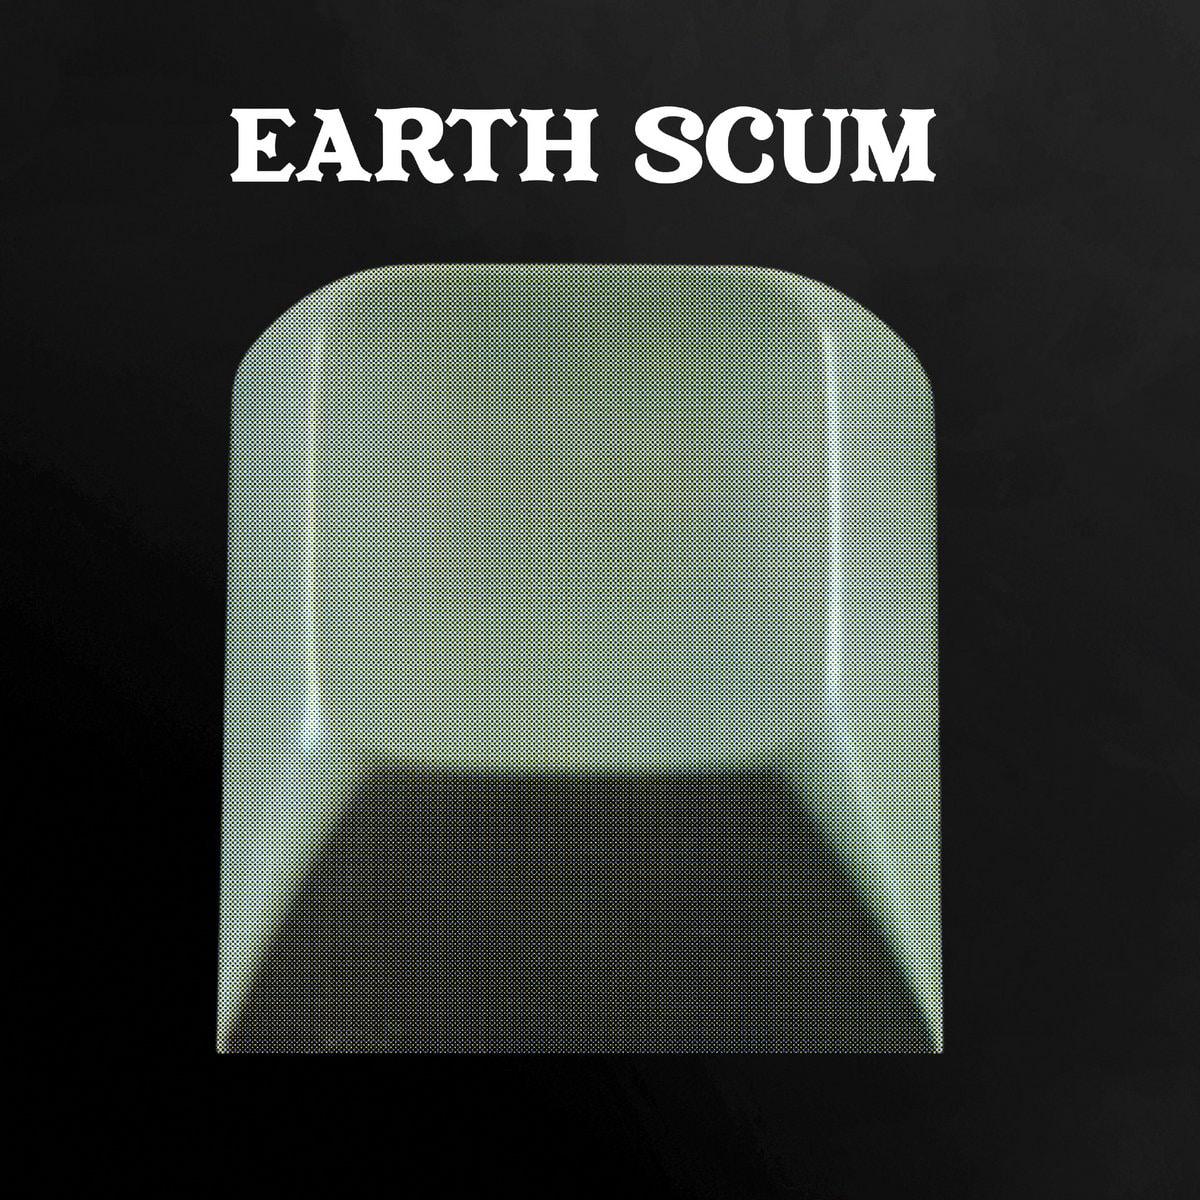 FYI Chris - Earth Scum